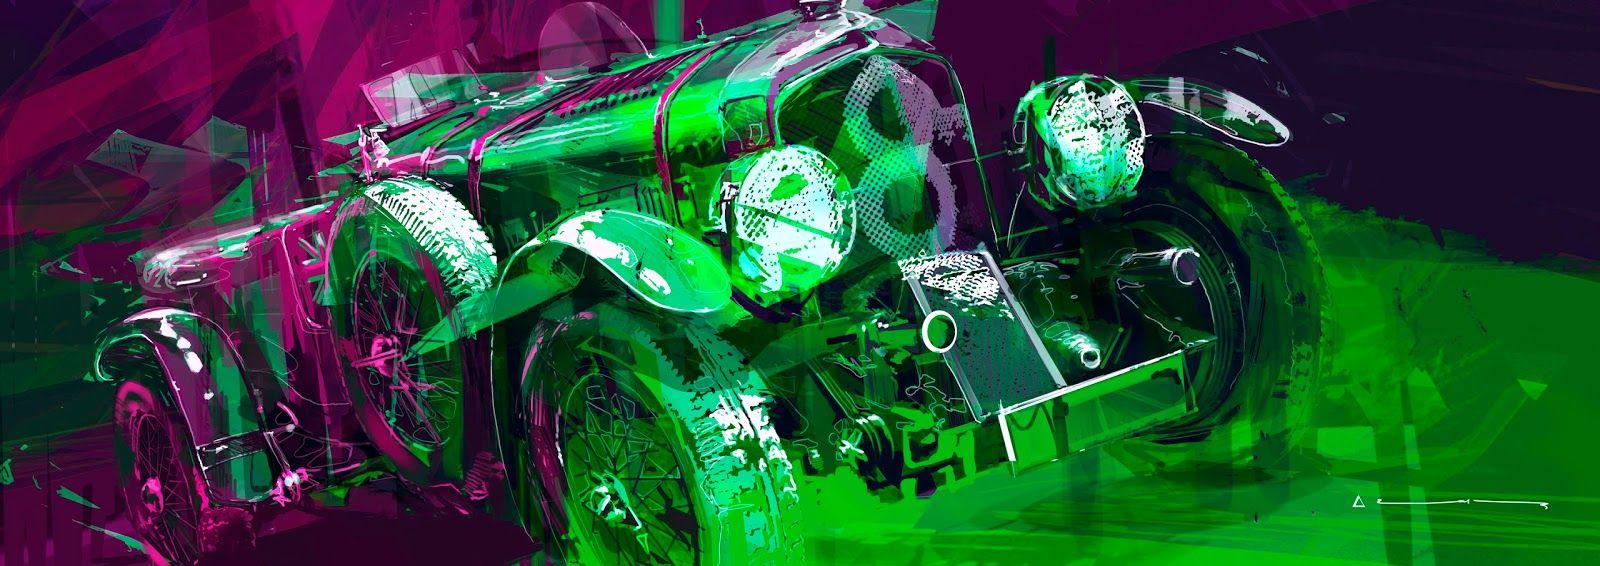 Bentley blower arthur coudert blueprint art and car art bentley blower arthur coudert bentley blowerblueprint artconcept malvernweather Gallery